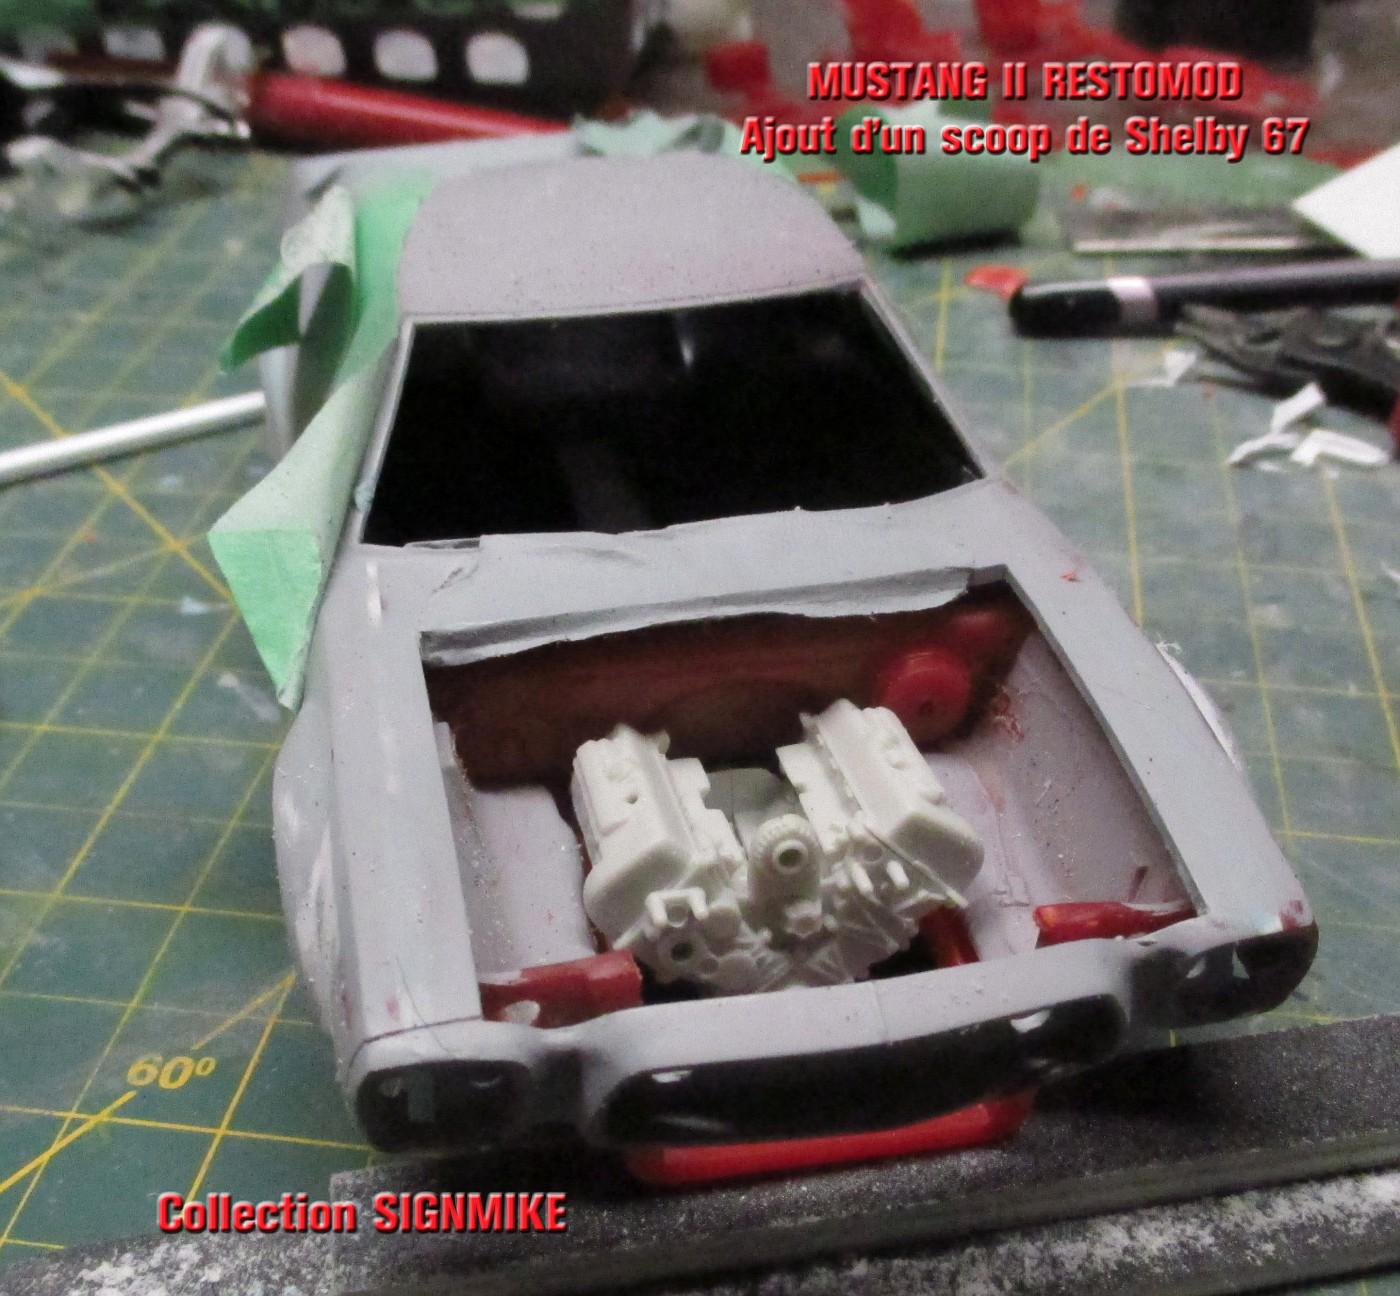 Mustang II RestoMod - Page 3 MustangIIRestomod33-vi